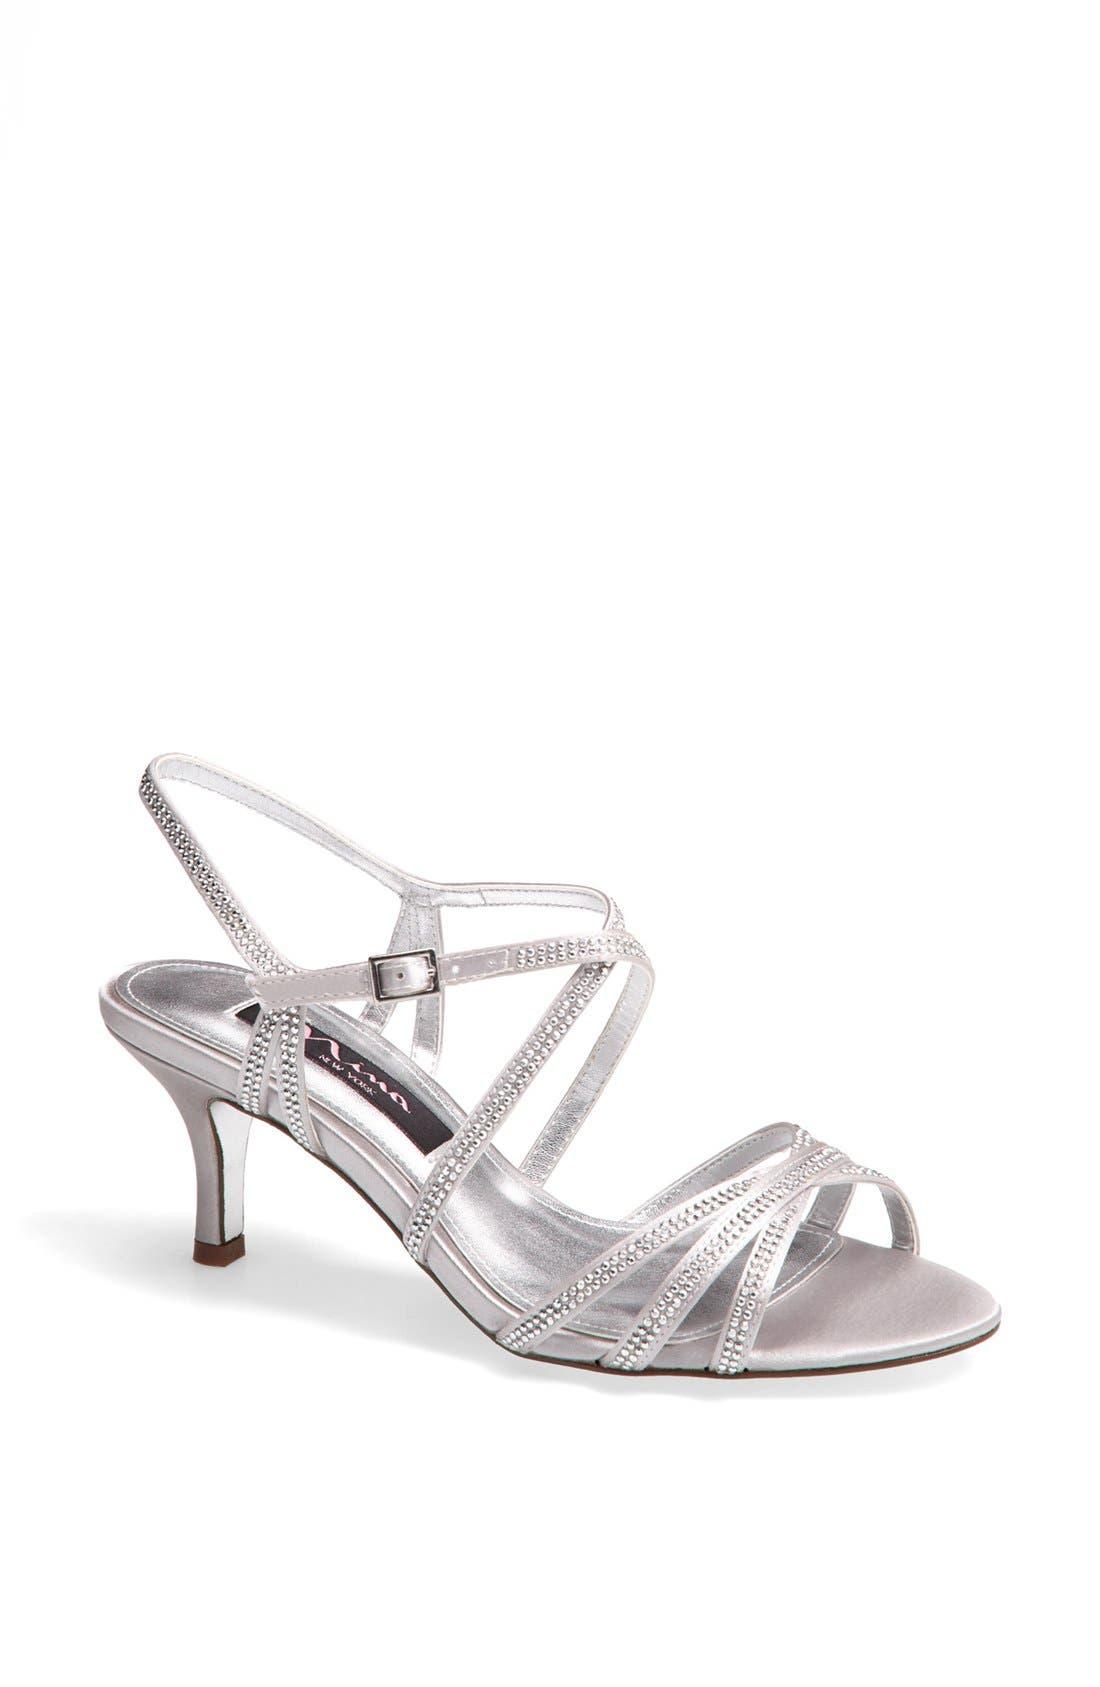 Alternate Image 1 Selected - Nina 'Caprese' Sandal